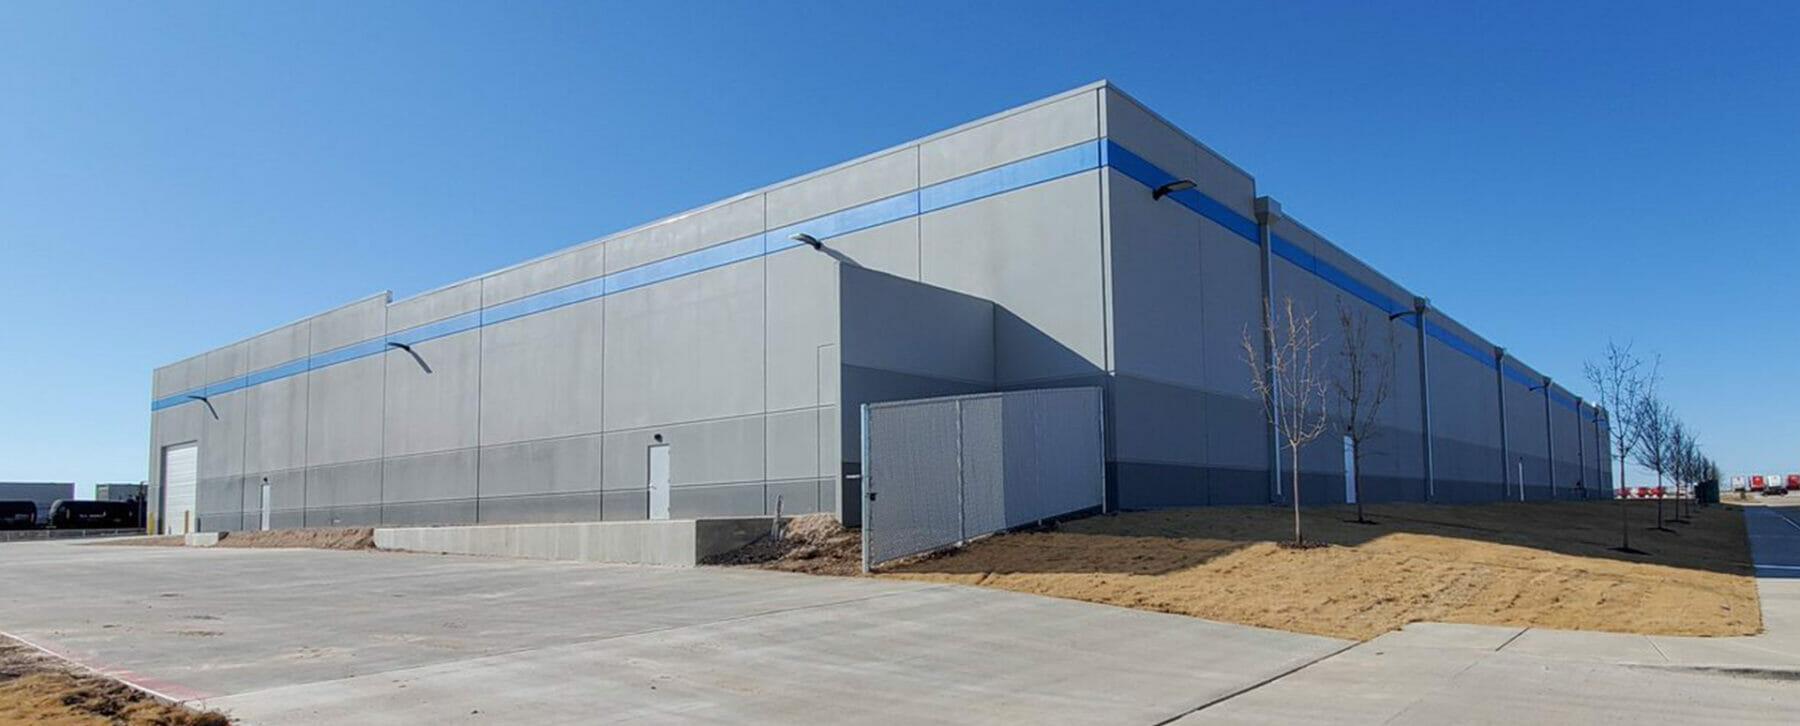 CHEP Warehouse - Amarillo, TX 2